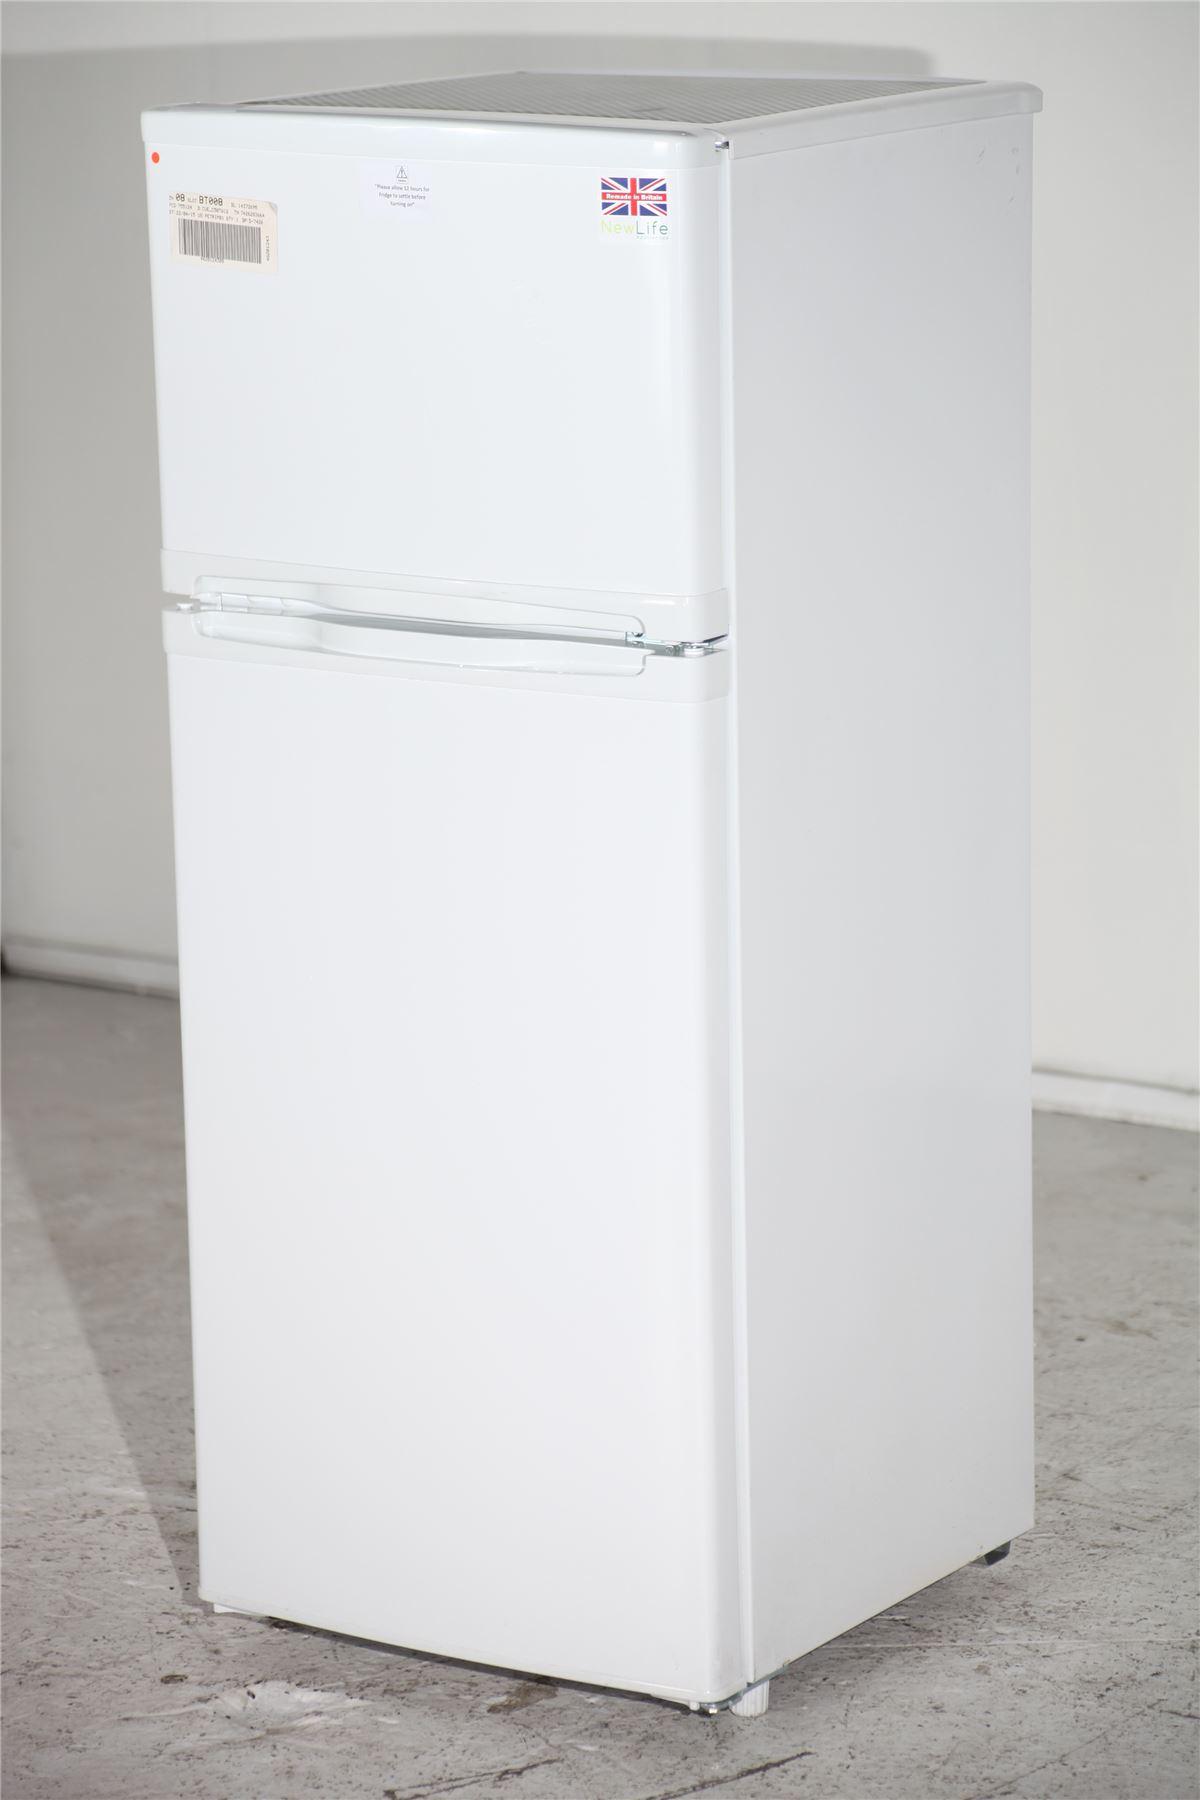 preloved currys essentials fridge freezer c50tw12. Black Bedroom Furniture Sets. Home Design Ideas